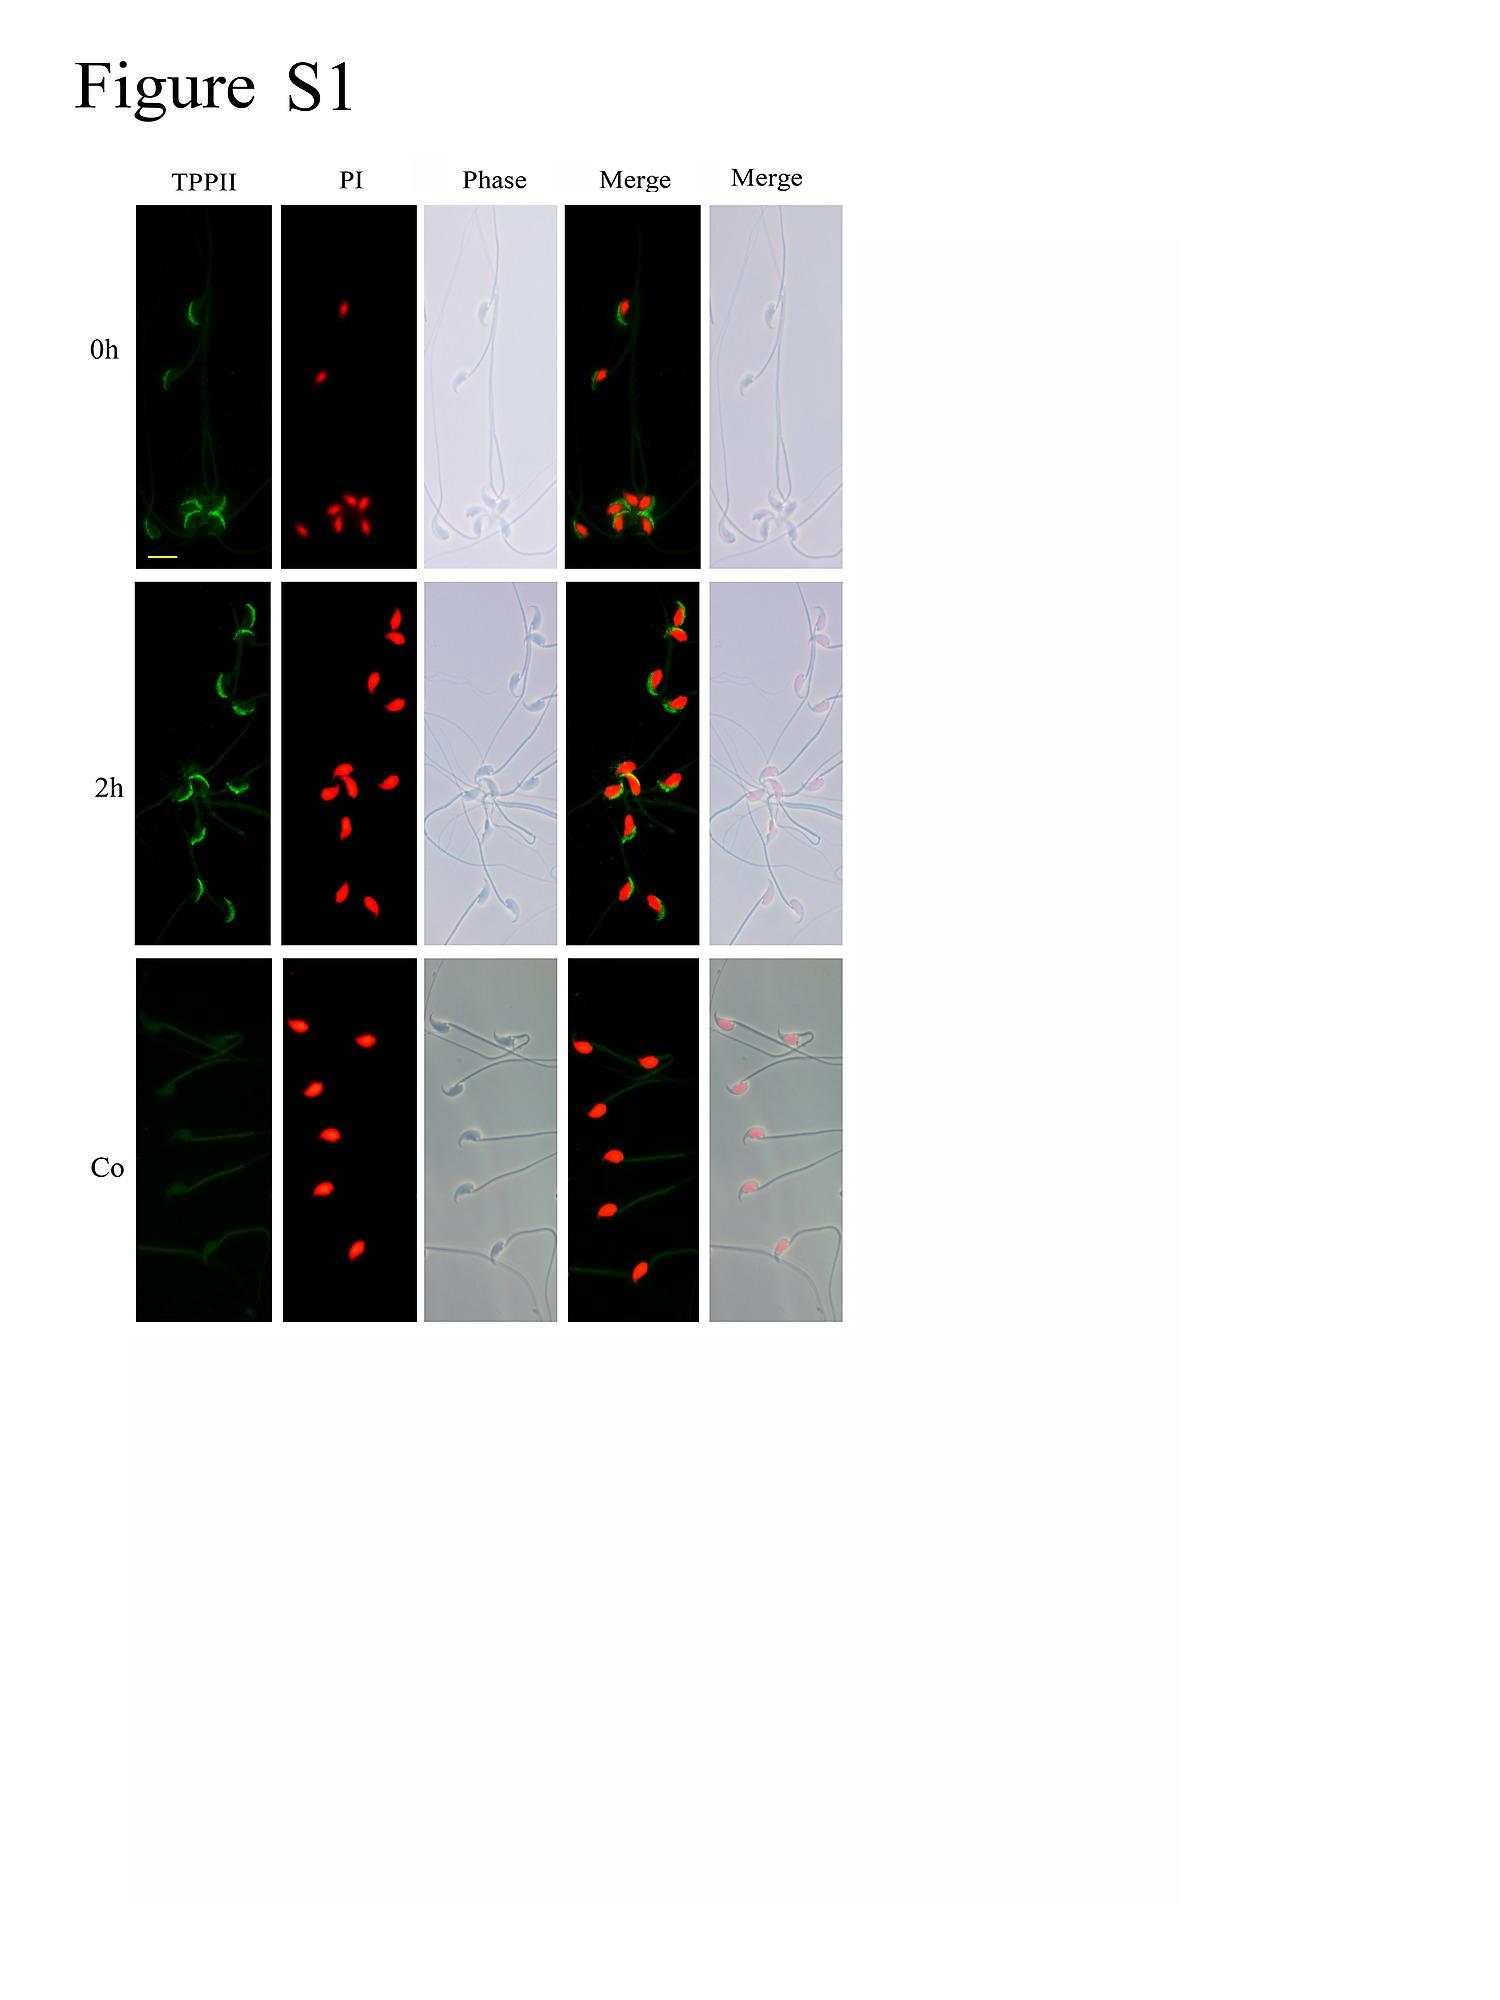 Tripeptidyl Peptidase Ii Regulates Sperm Function By Modulating